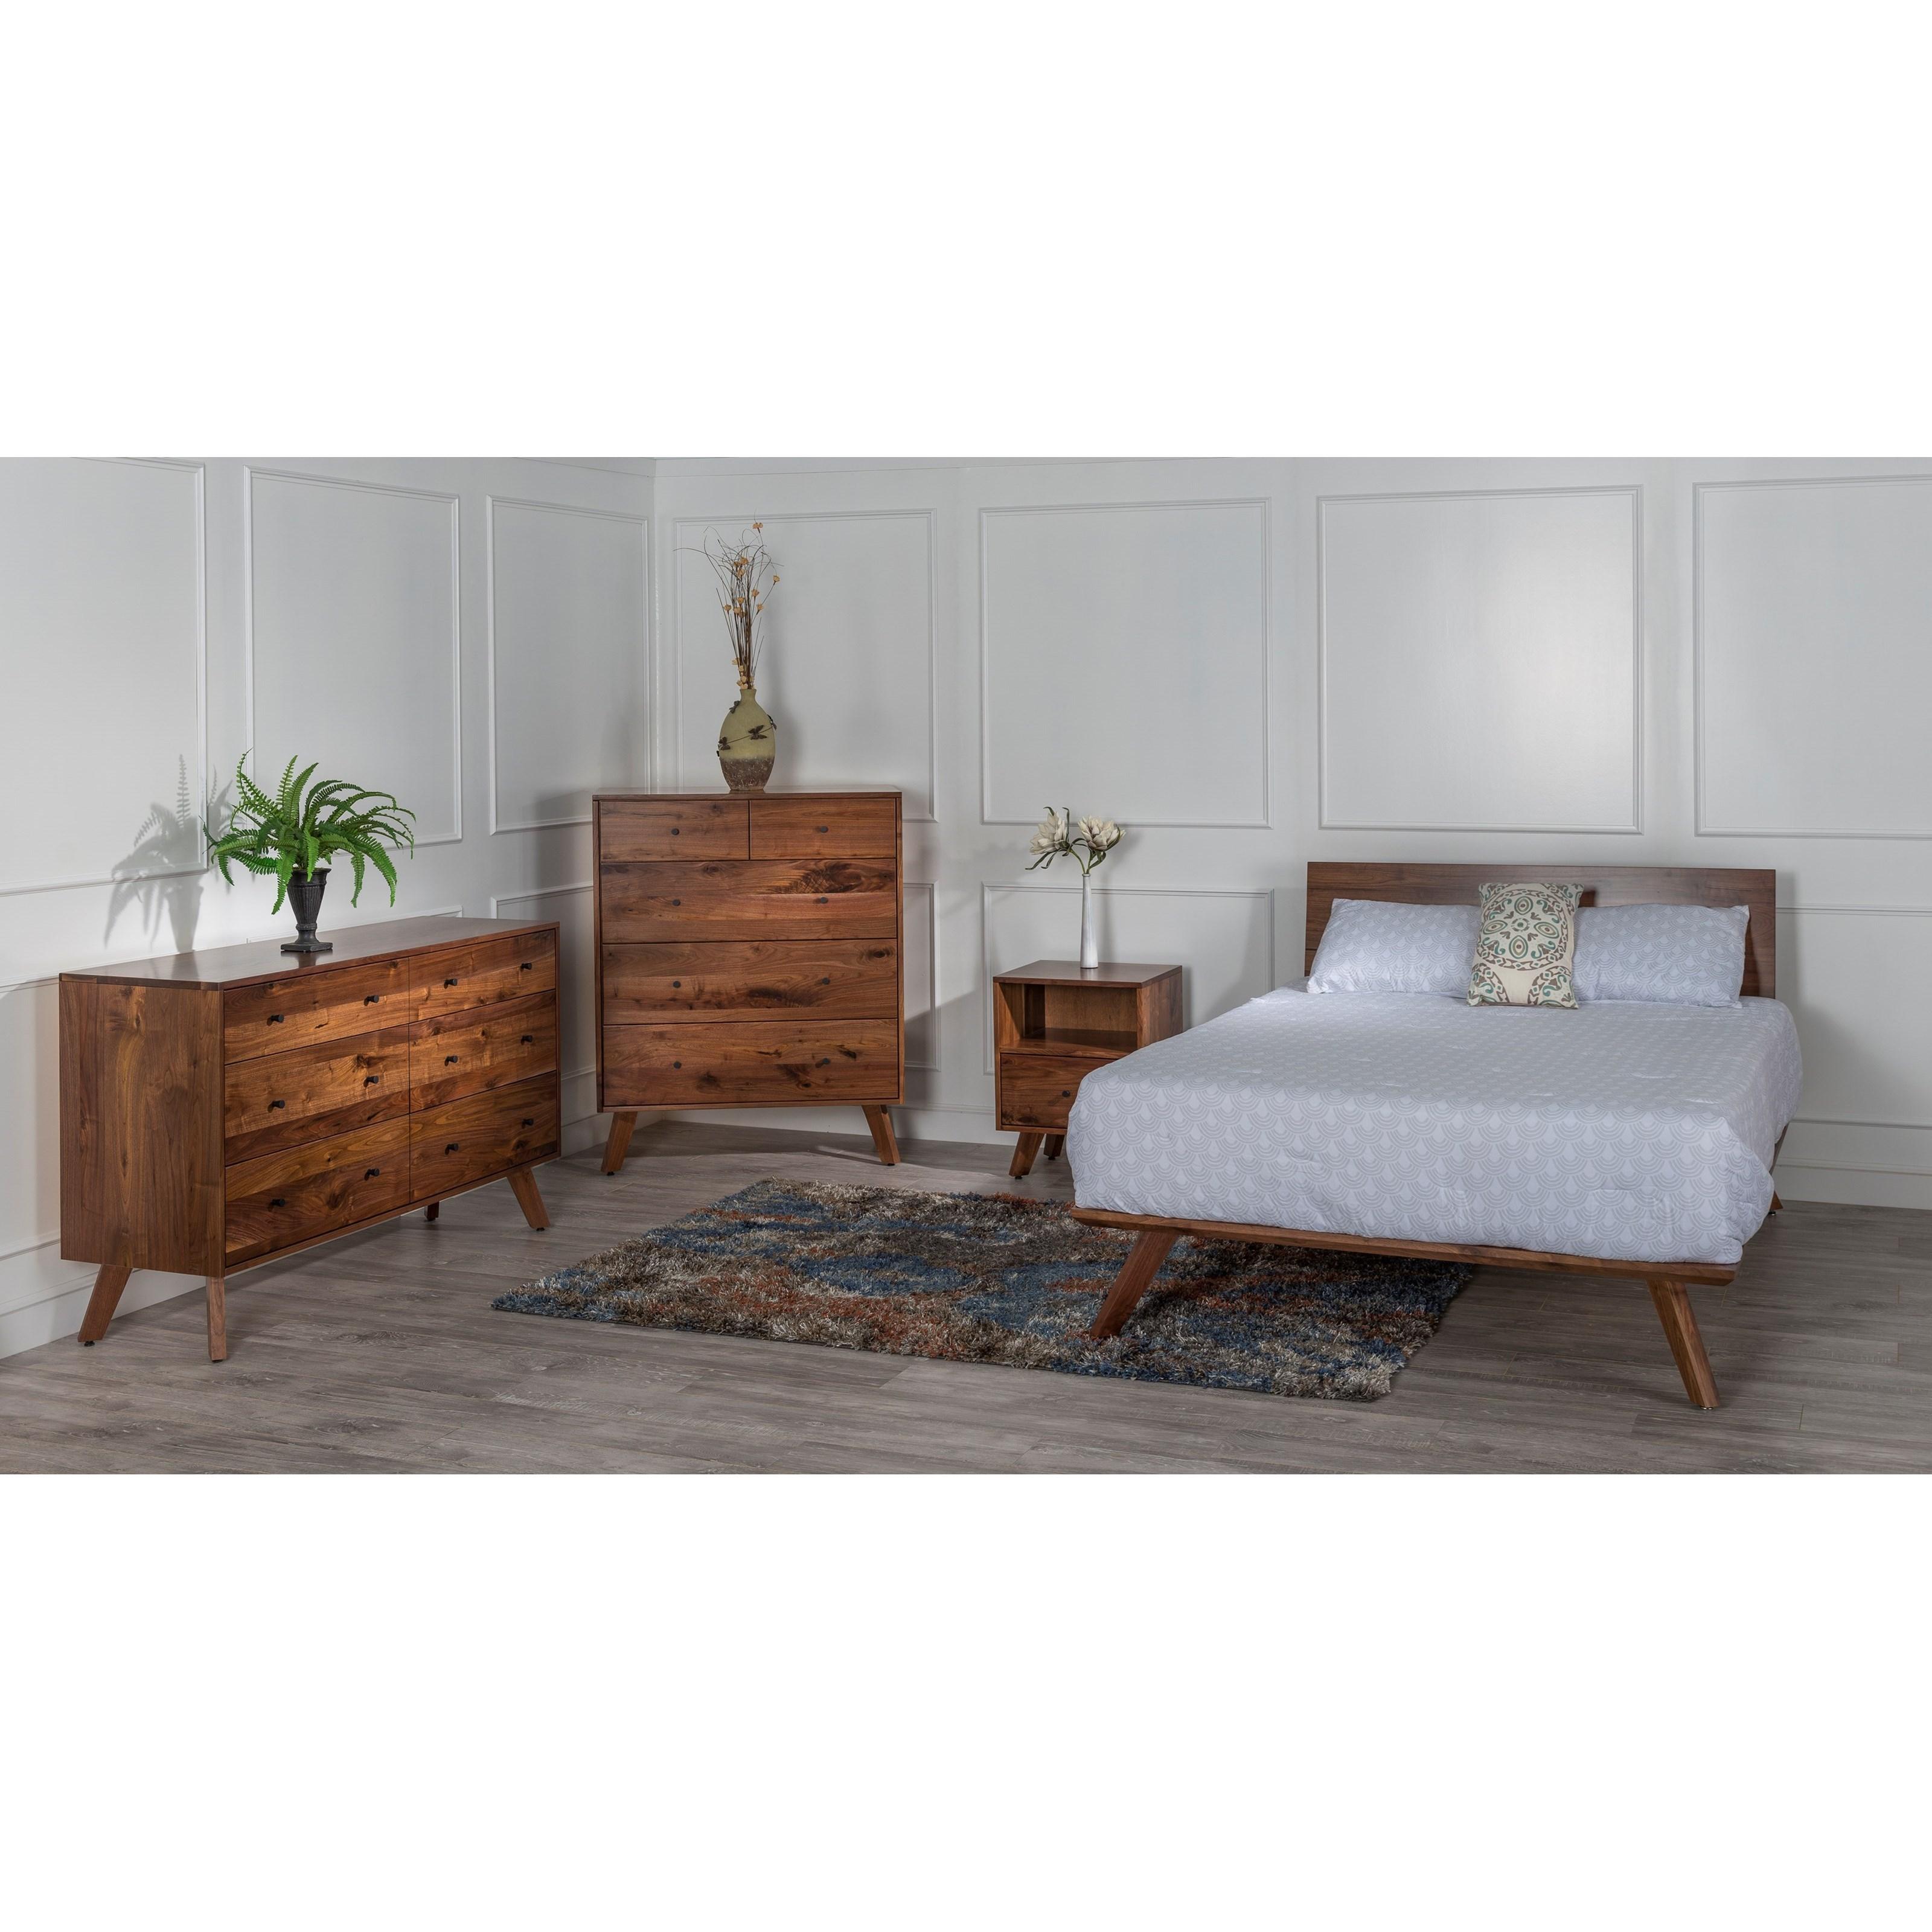 Sullivan Bay Customizable Queen Bedroom Group by Glenmont Furniture at Saugerties Furniture Mart